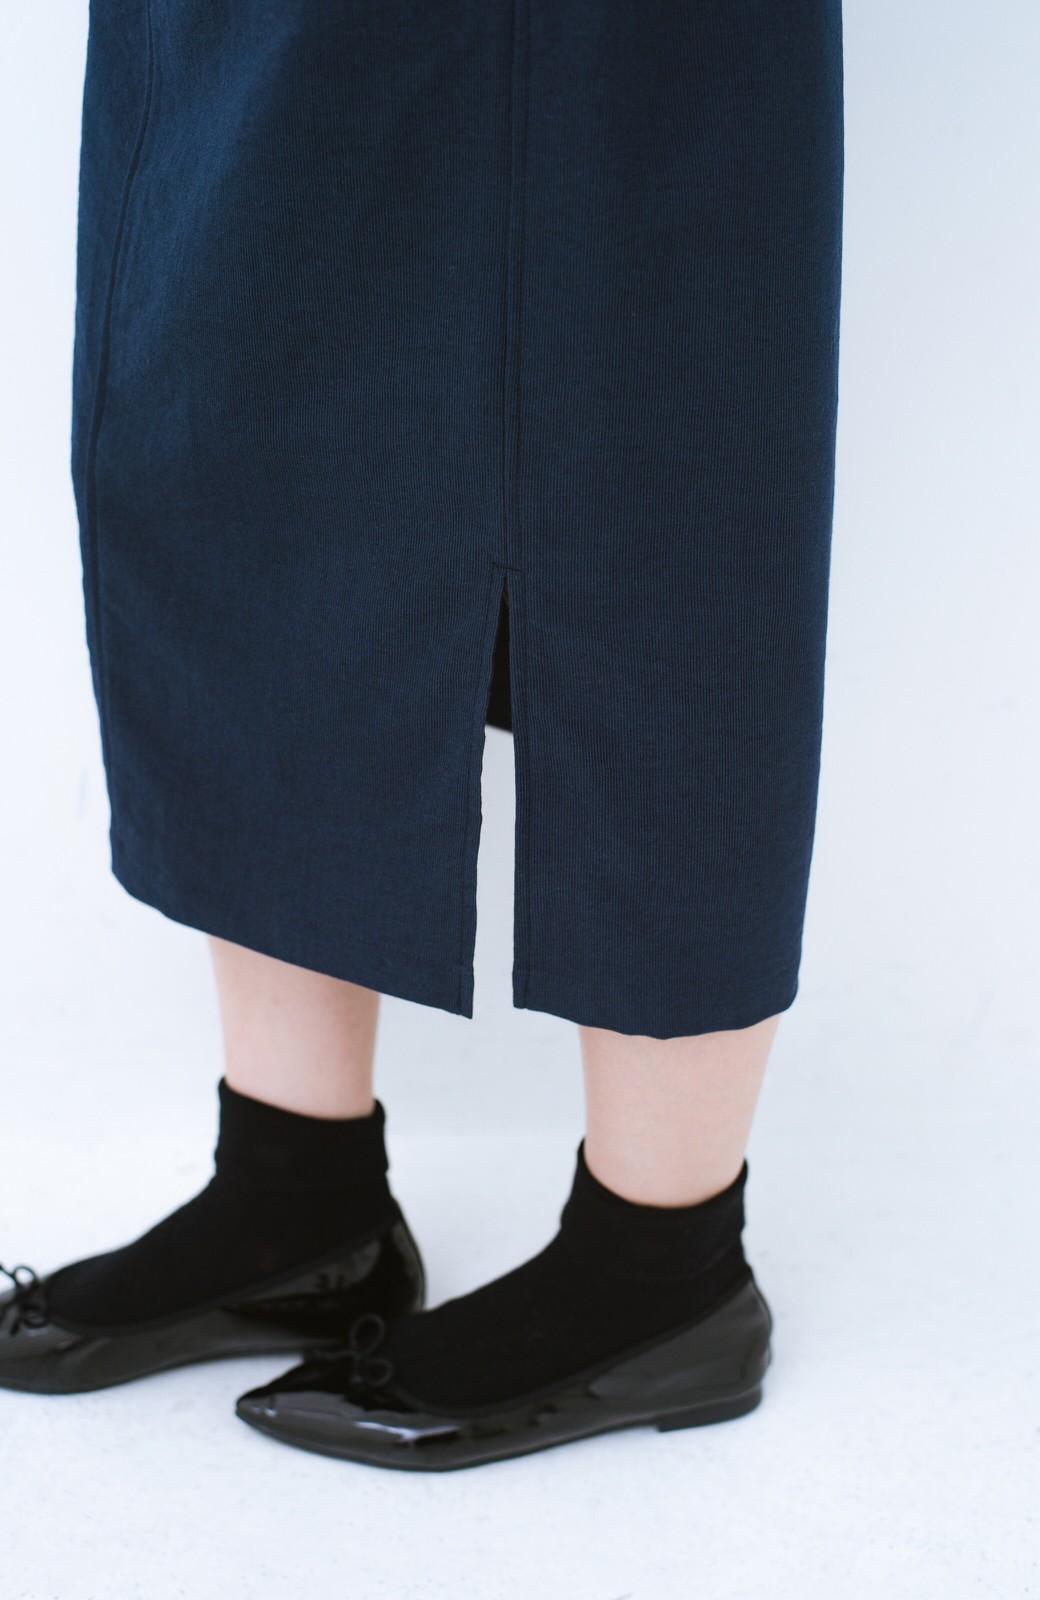 haco!  腹巻きとは呼ばせない ブルー期も華やかに過ごせる消臭加工裏地付きフリルデザインスカートセット【ブルー期】女の子バンザイ!プロジェクト <ネイビー>の商品写真17